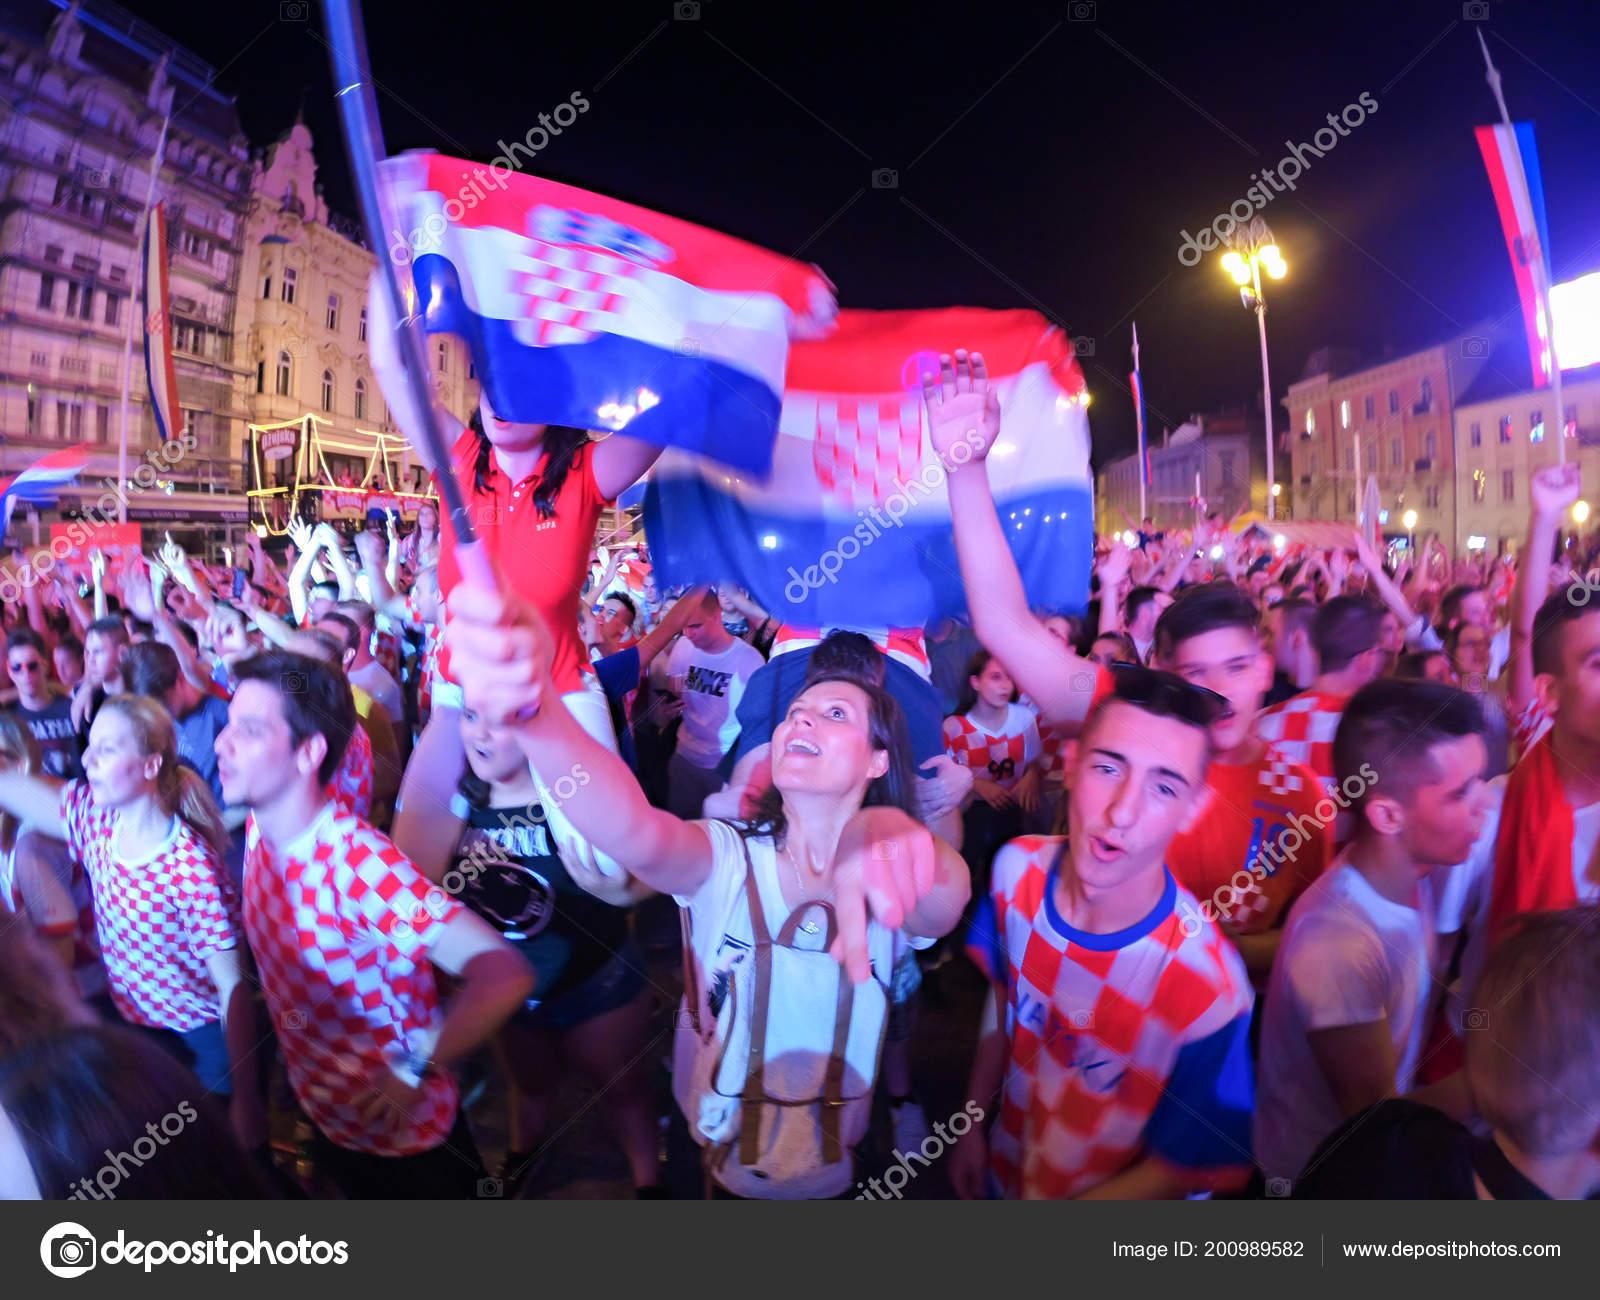 Amazing Argentina v Croatia - 2018 FIFA World Cup Russia - depositphotos_200989582-stock-photo-zagreb-croatia-june-croatian-football  Best Photo Reference-124322.jpg